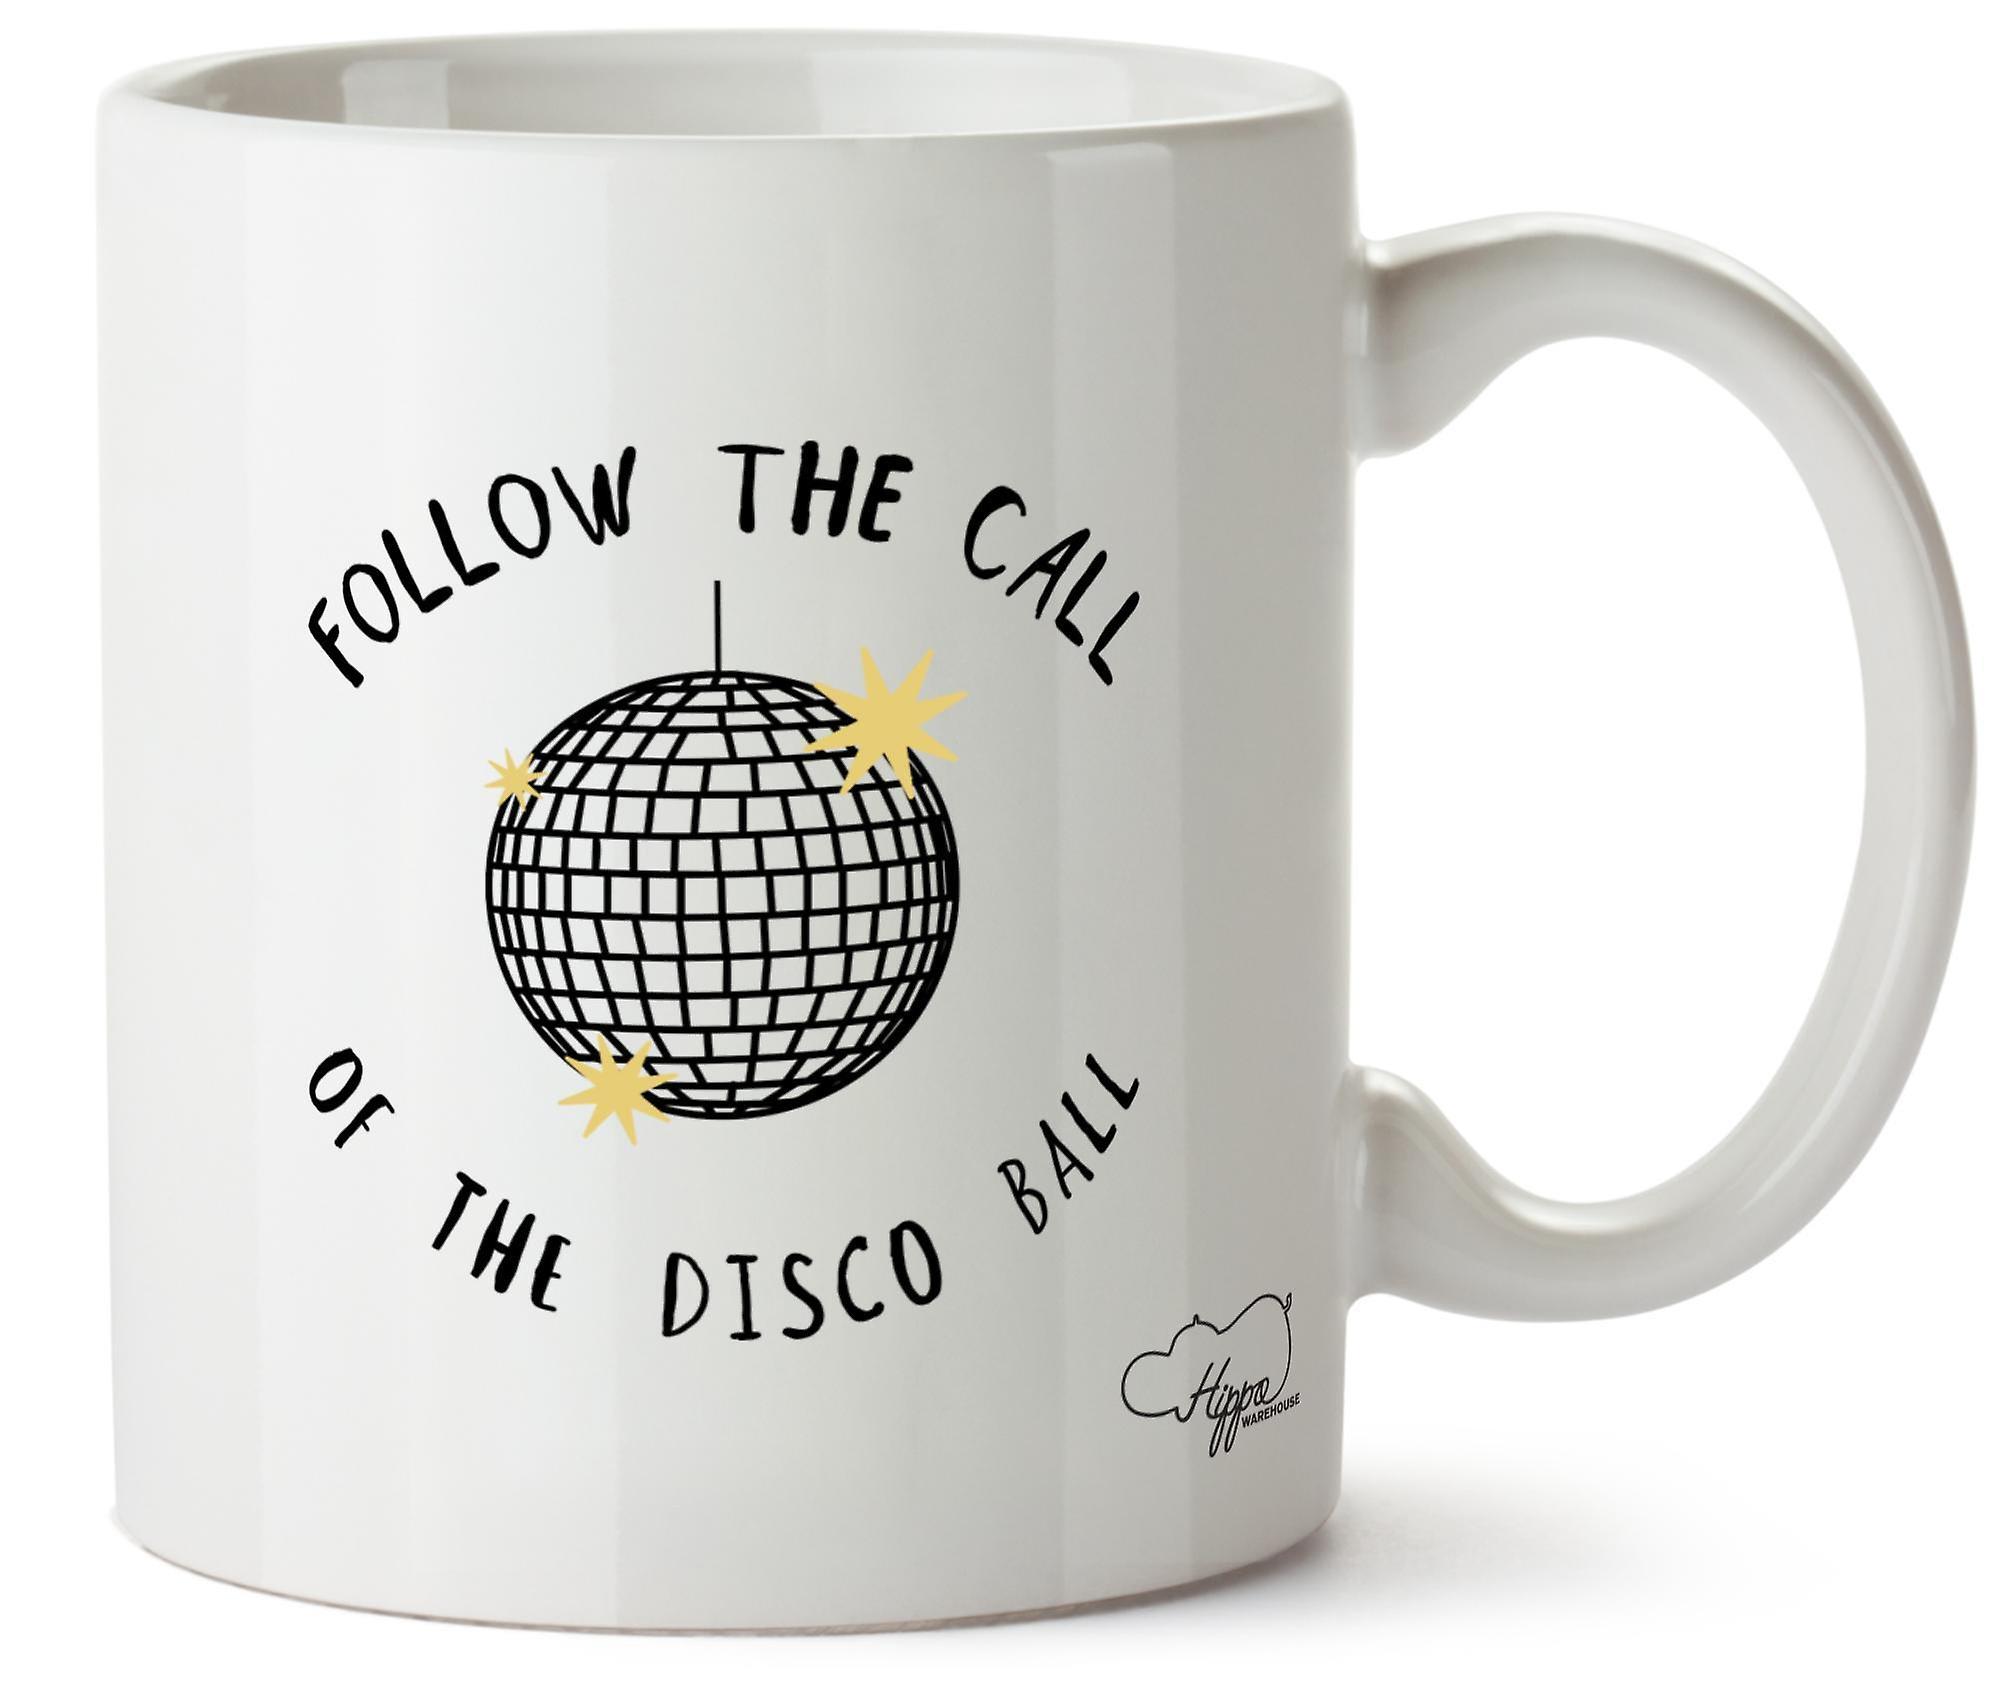 Hippowarehouse Follow The Call Of The Disco Ball Printed Mug Cup Ceramic 10oz